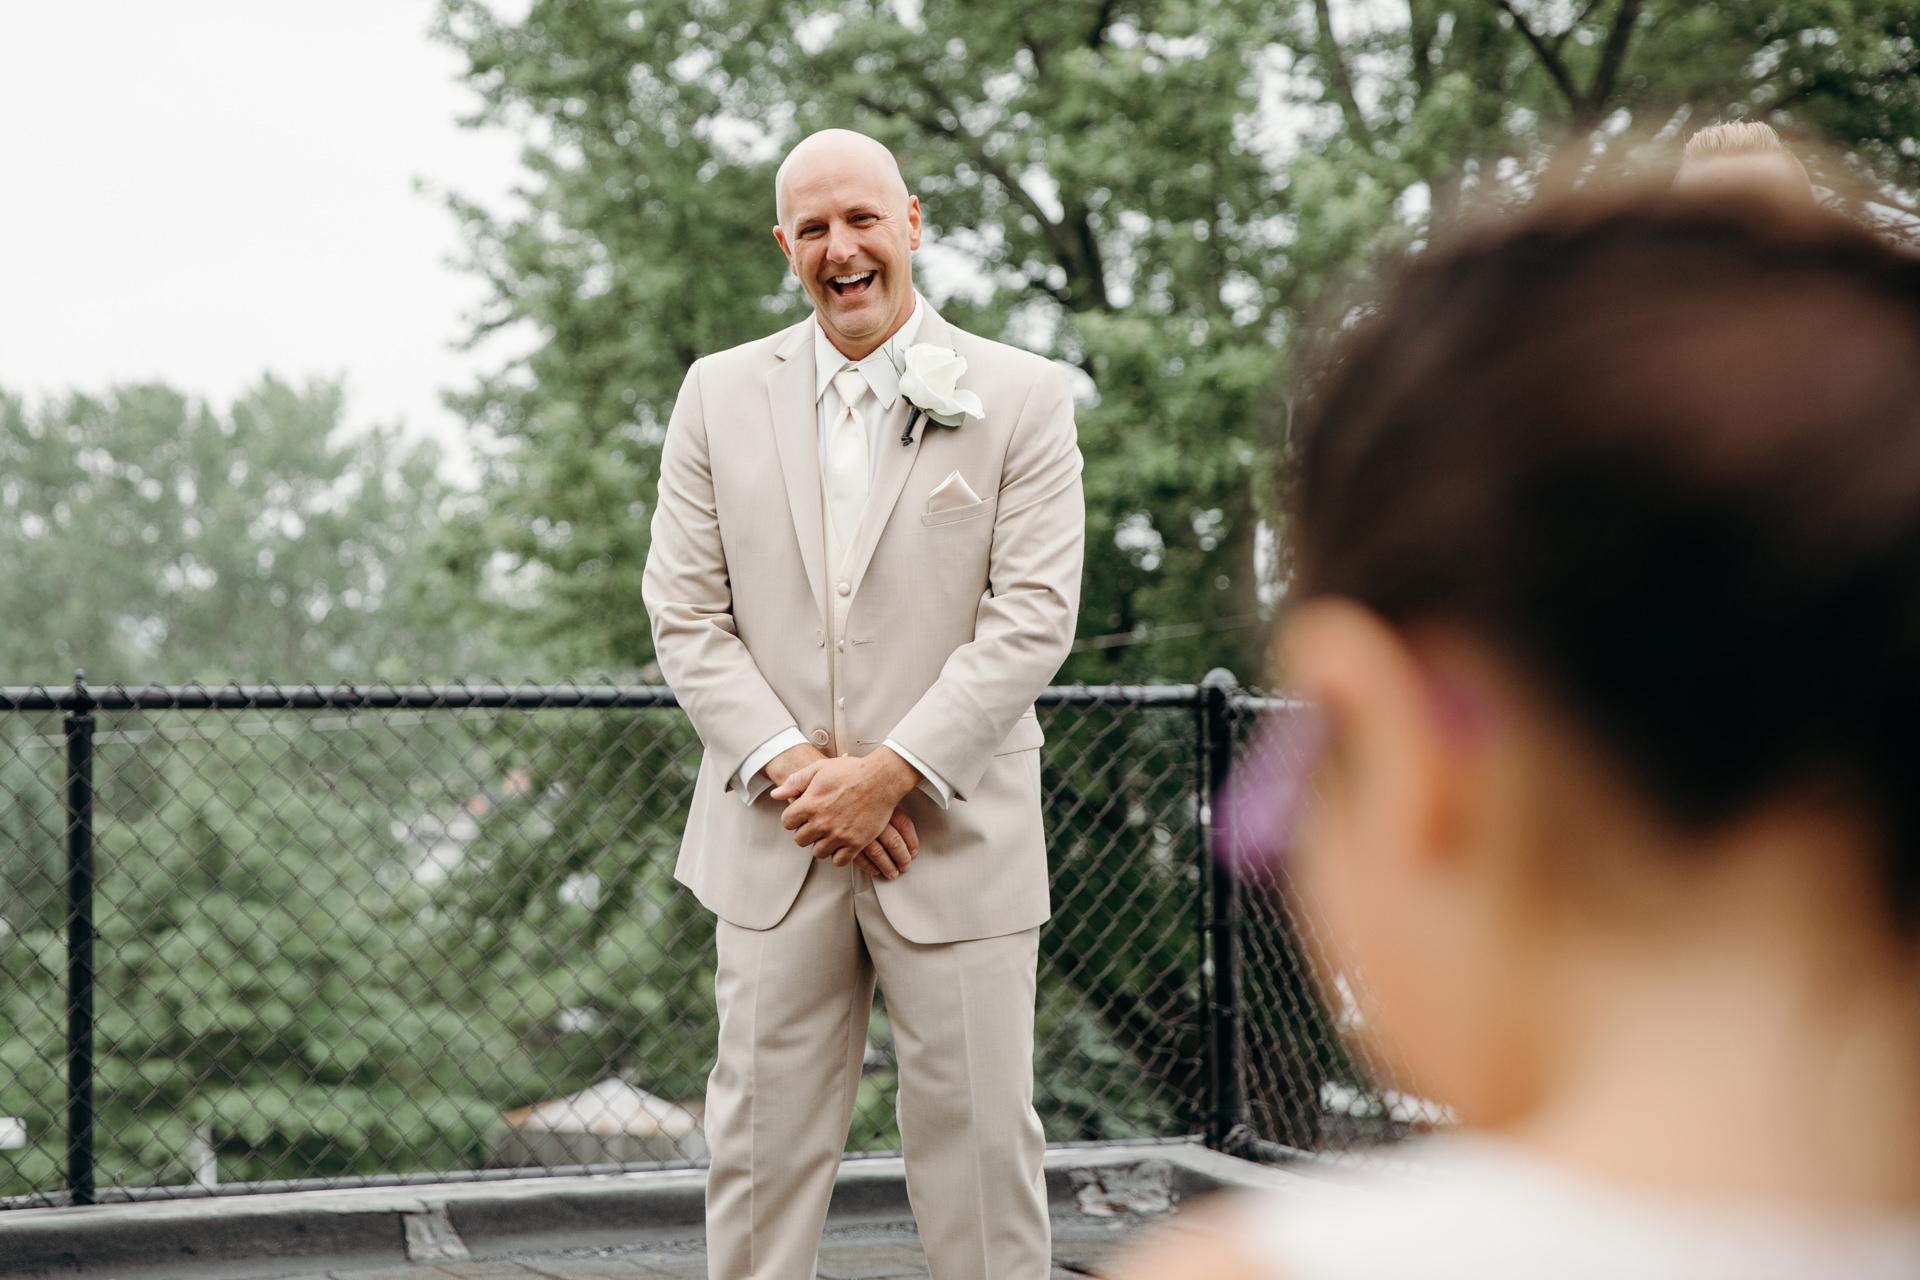 Grant Beachy Tammy Chris wedding photography goshen Saint Joseph veranda whitcomb-034.jpg